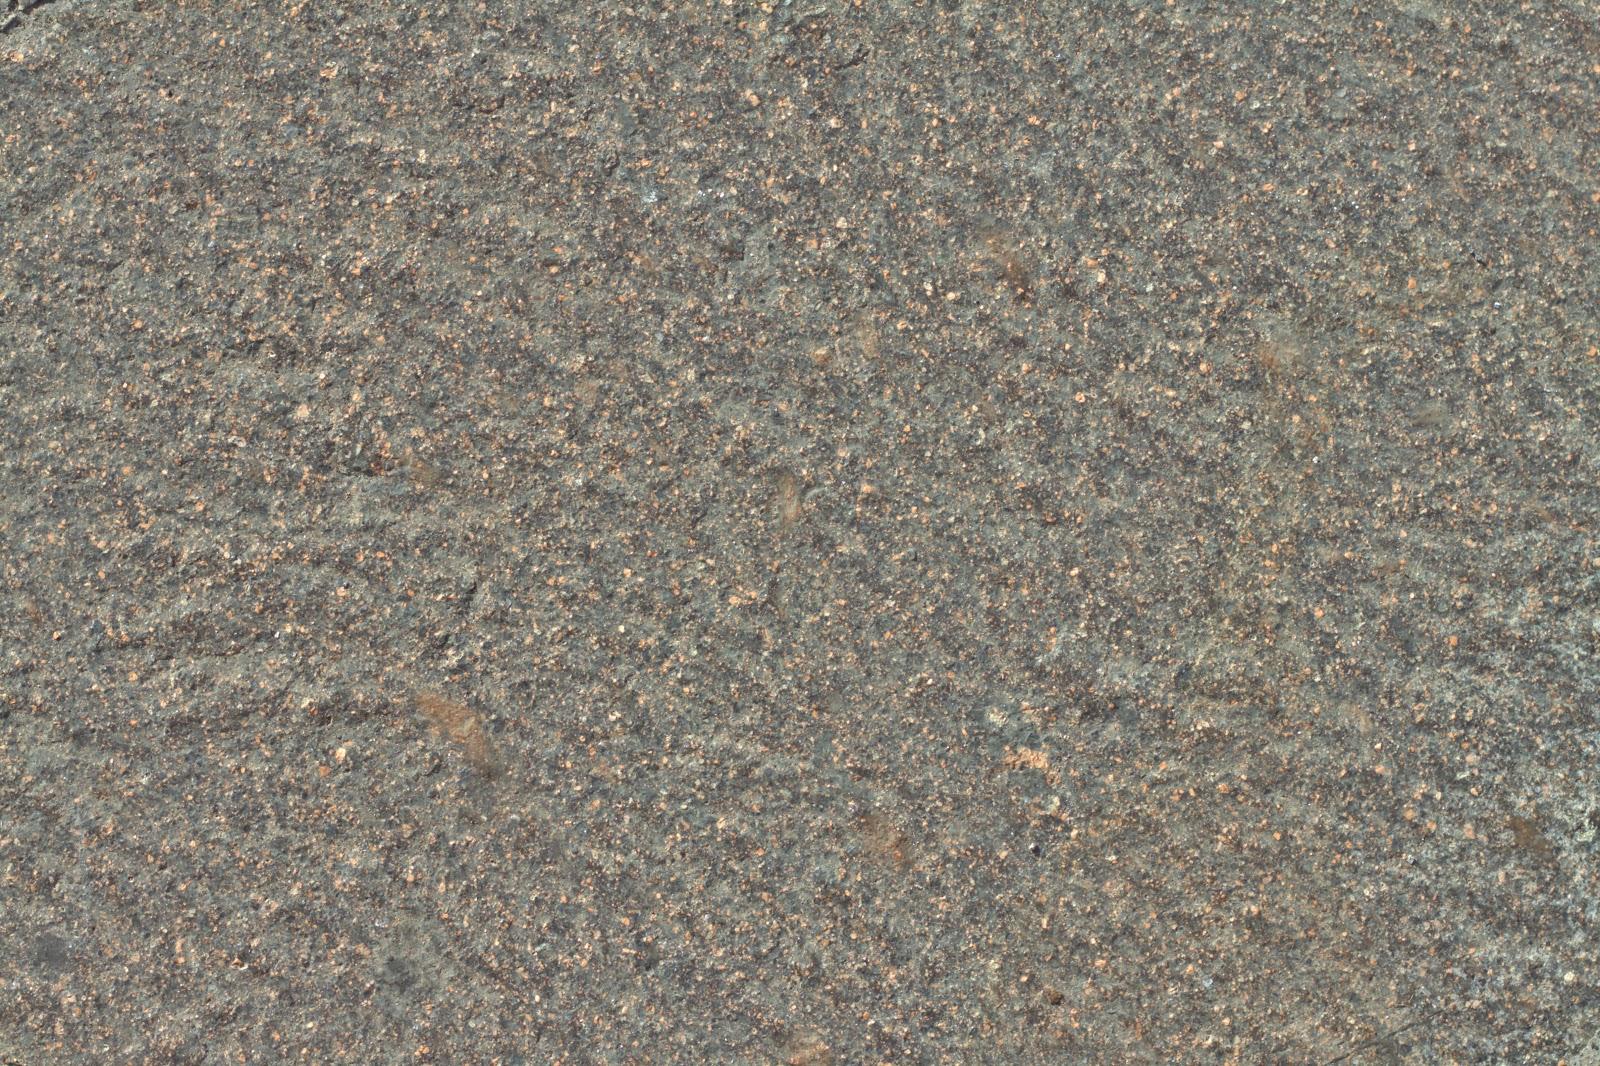 Stone marble concrete texture 4770x3178